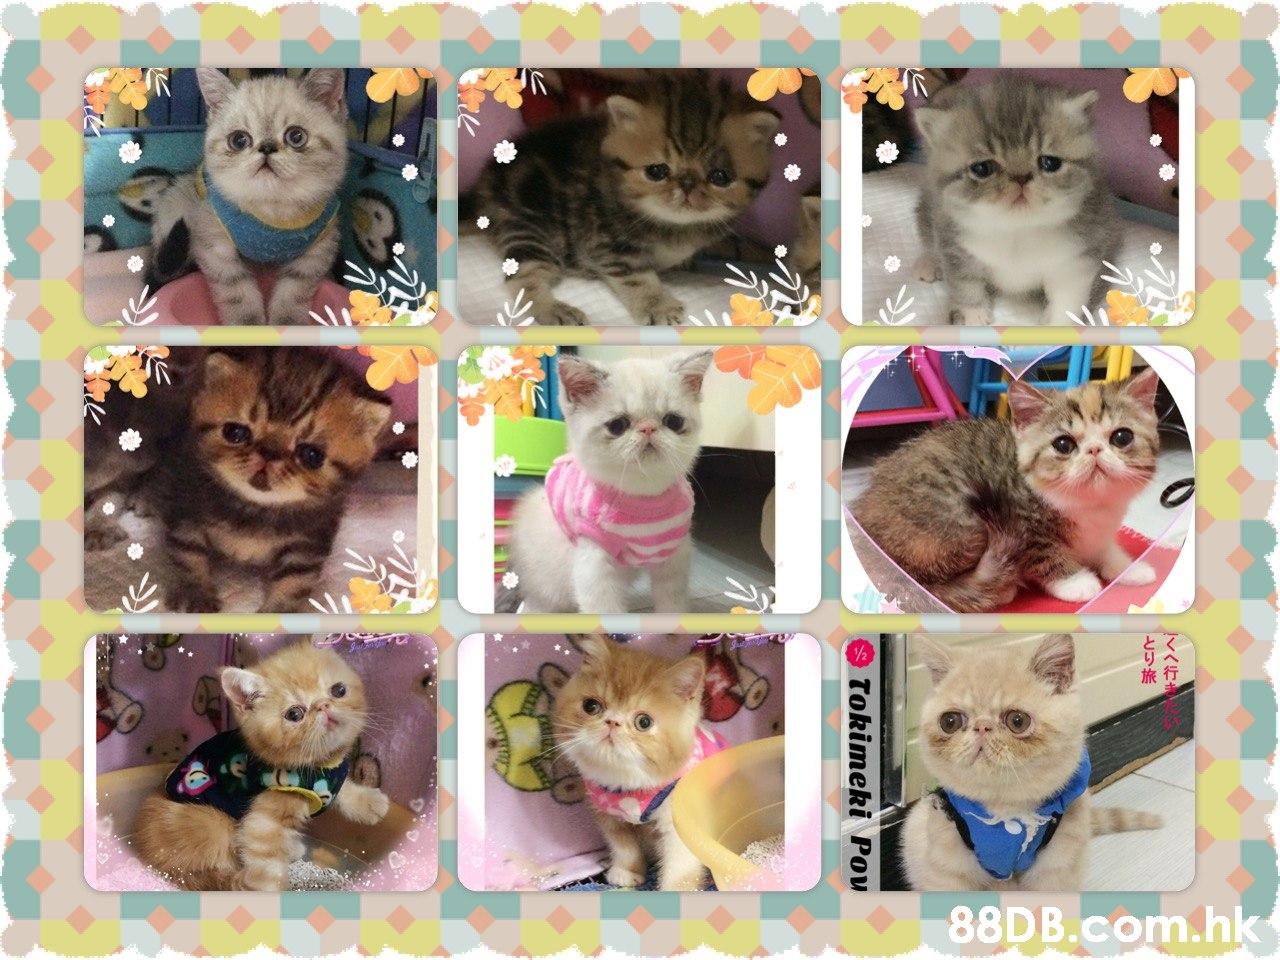 旅行 .hk Tokimeki Pov  Canidae,Puppy,Cat,Collage,Kitten